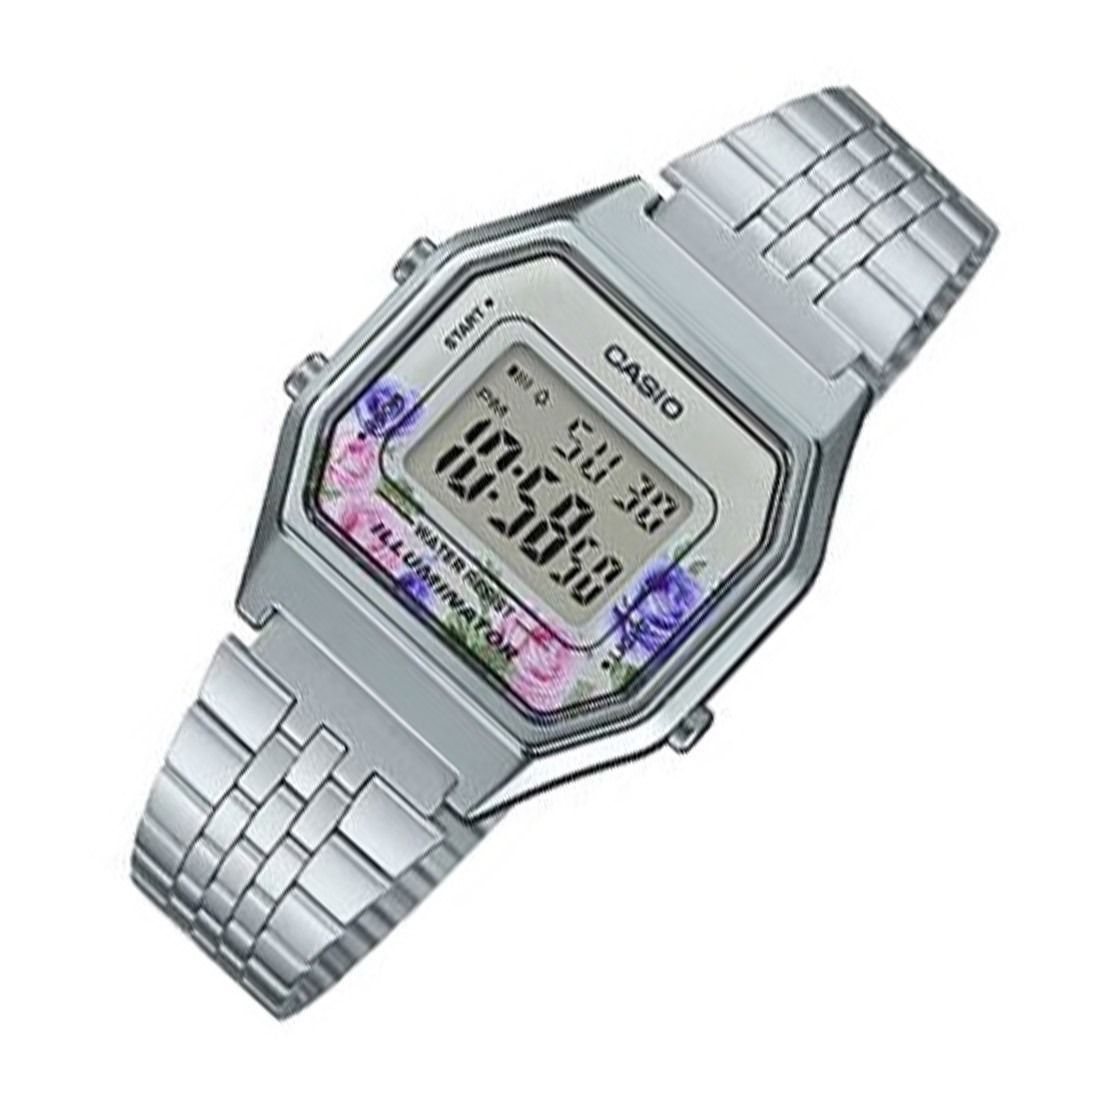 680wa 6 Selfie Reloj Casio La Flores Cuotas 4c Vintage uwkiZOPXT